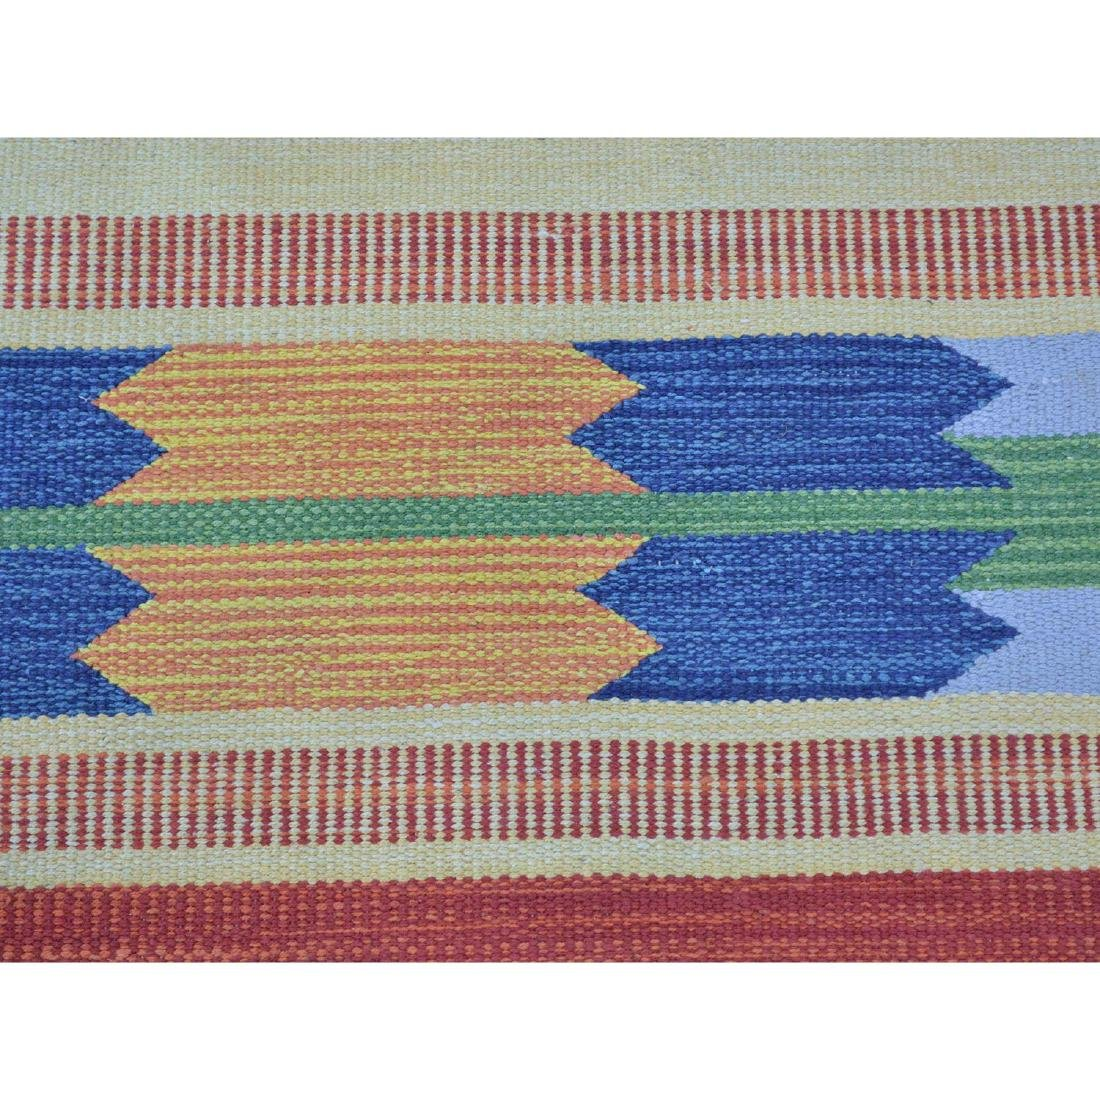 Navajo Design Hand Woven Flat Weave Killim Rug - 4